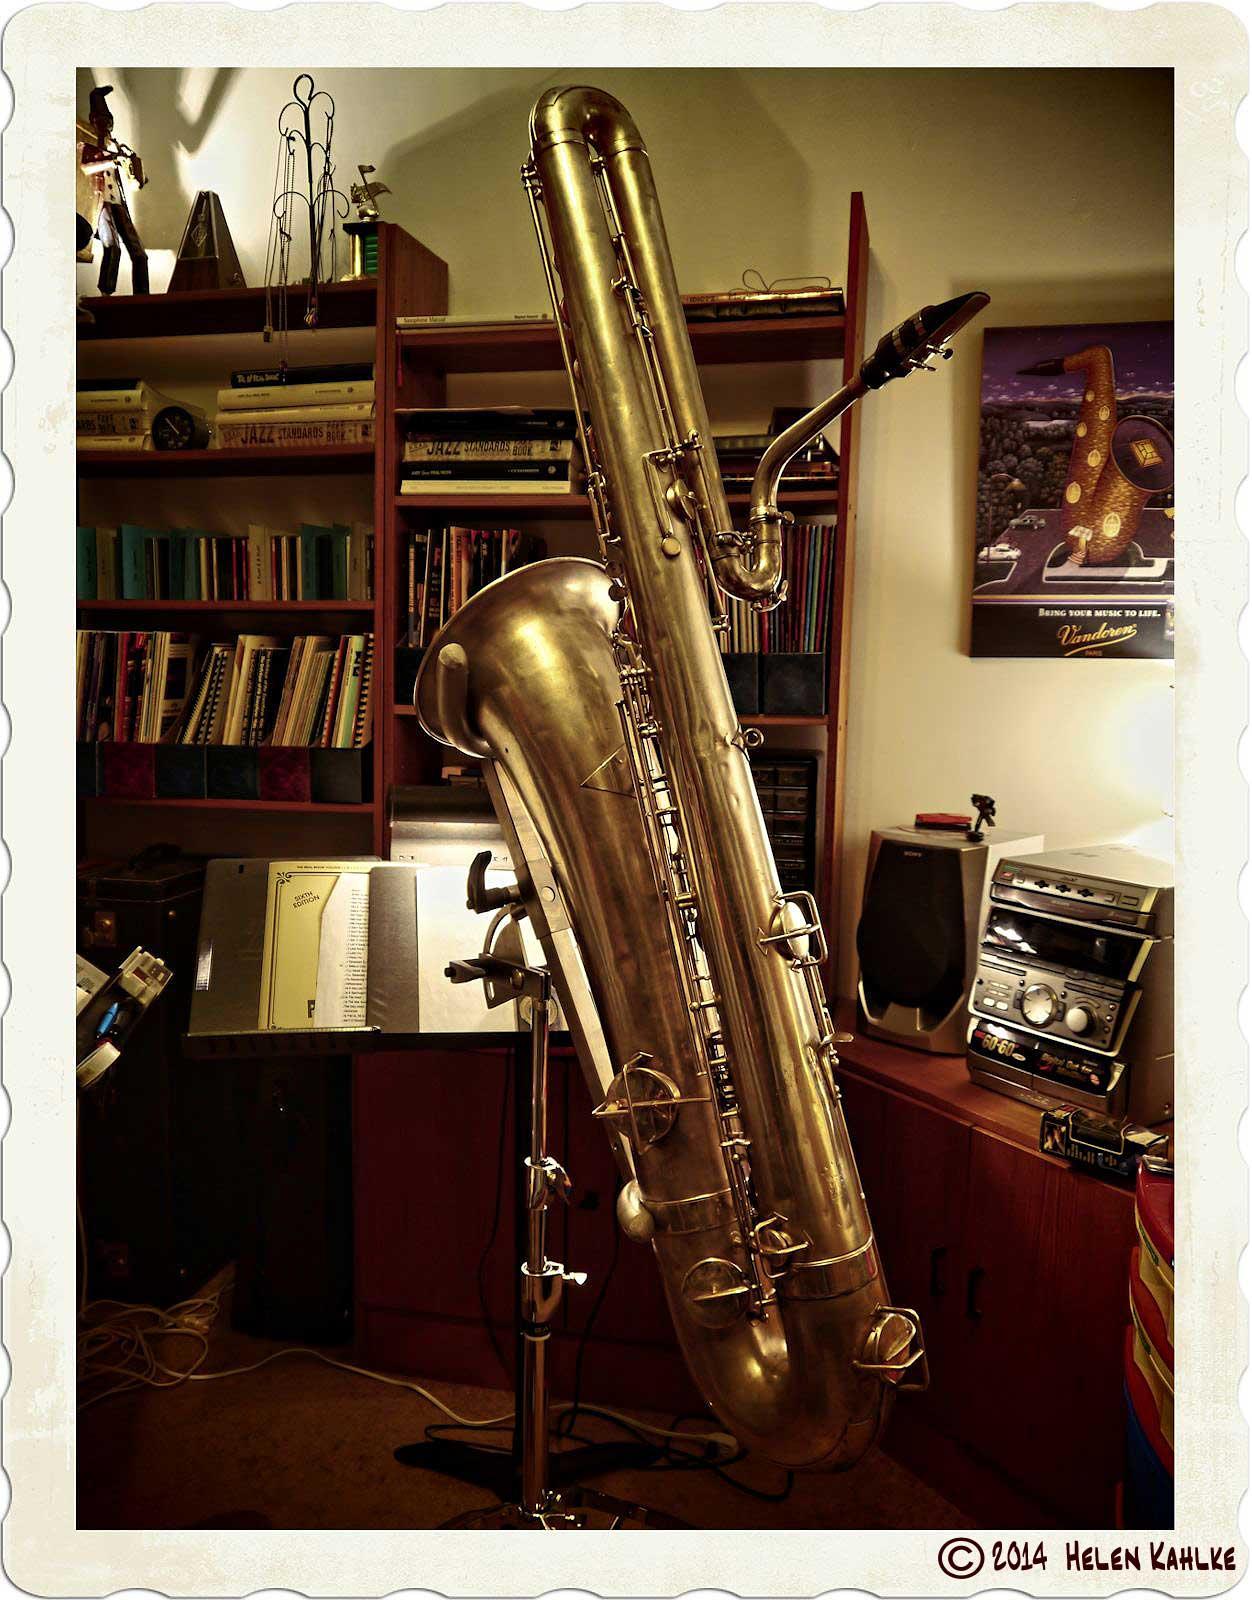 bass saxophone, Buescher bass sax, vintage sax, all about the bass, sax in sax stand, HDR photography